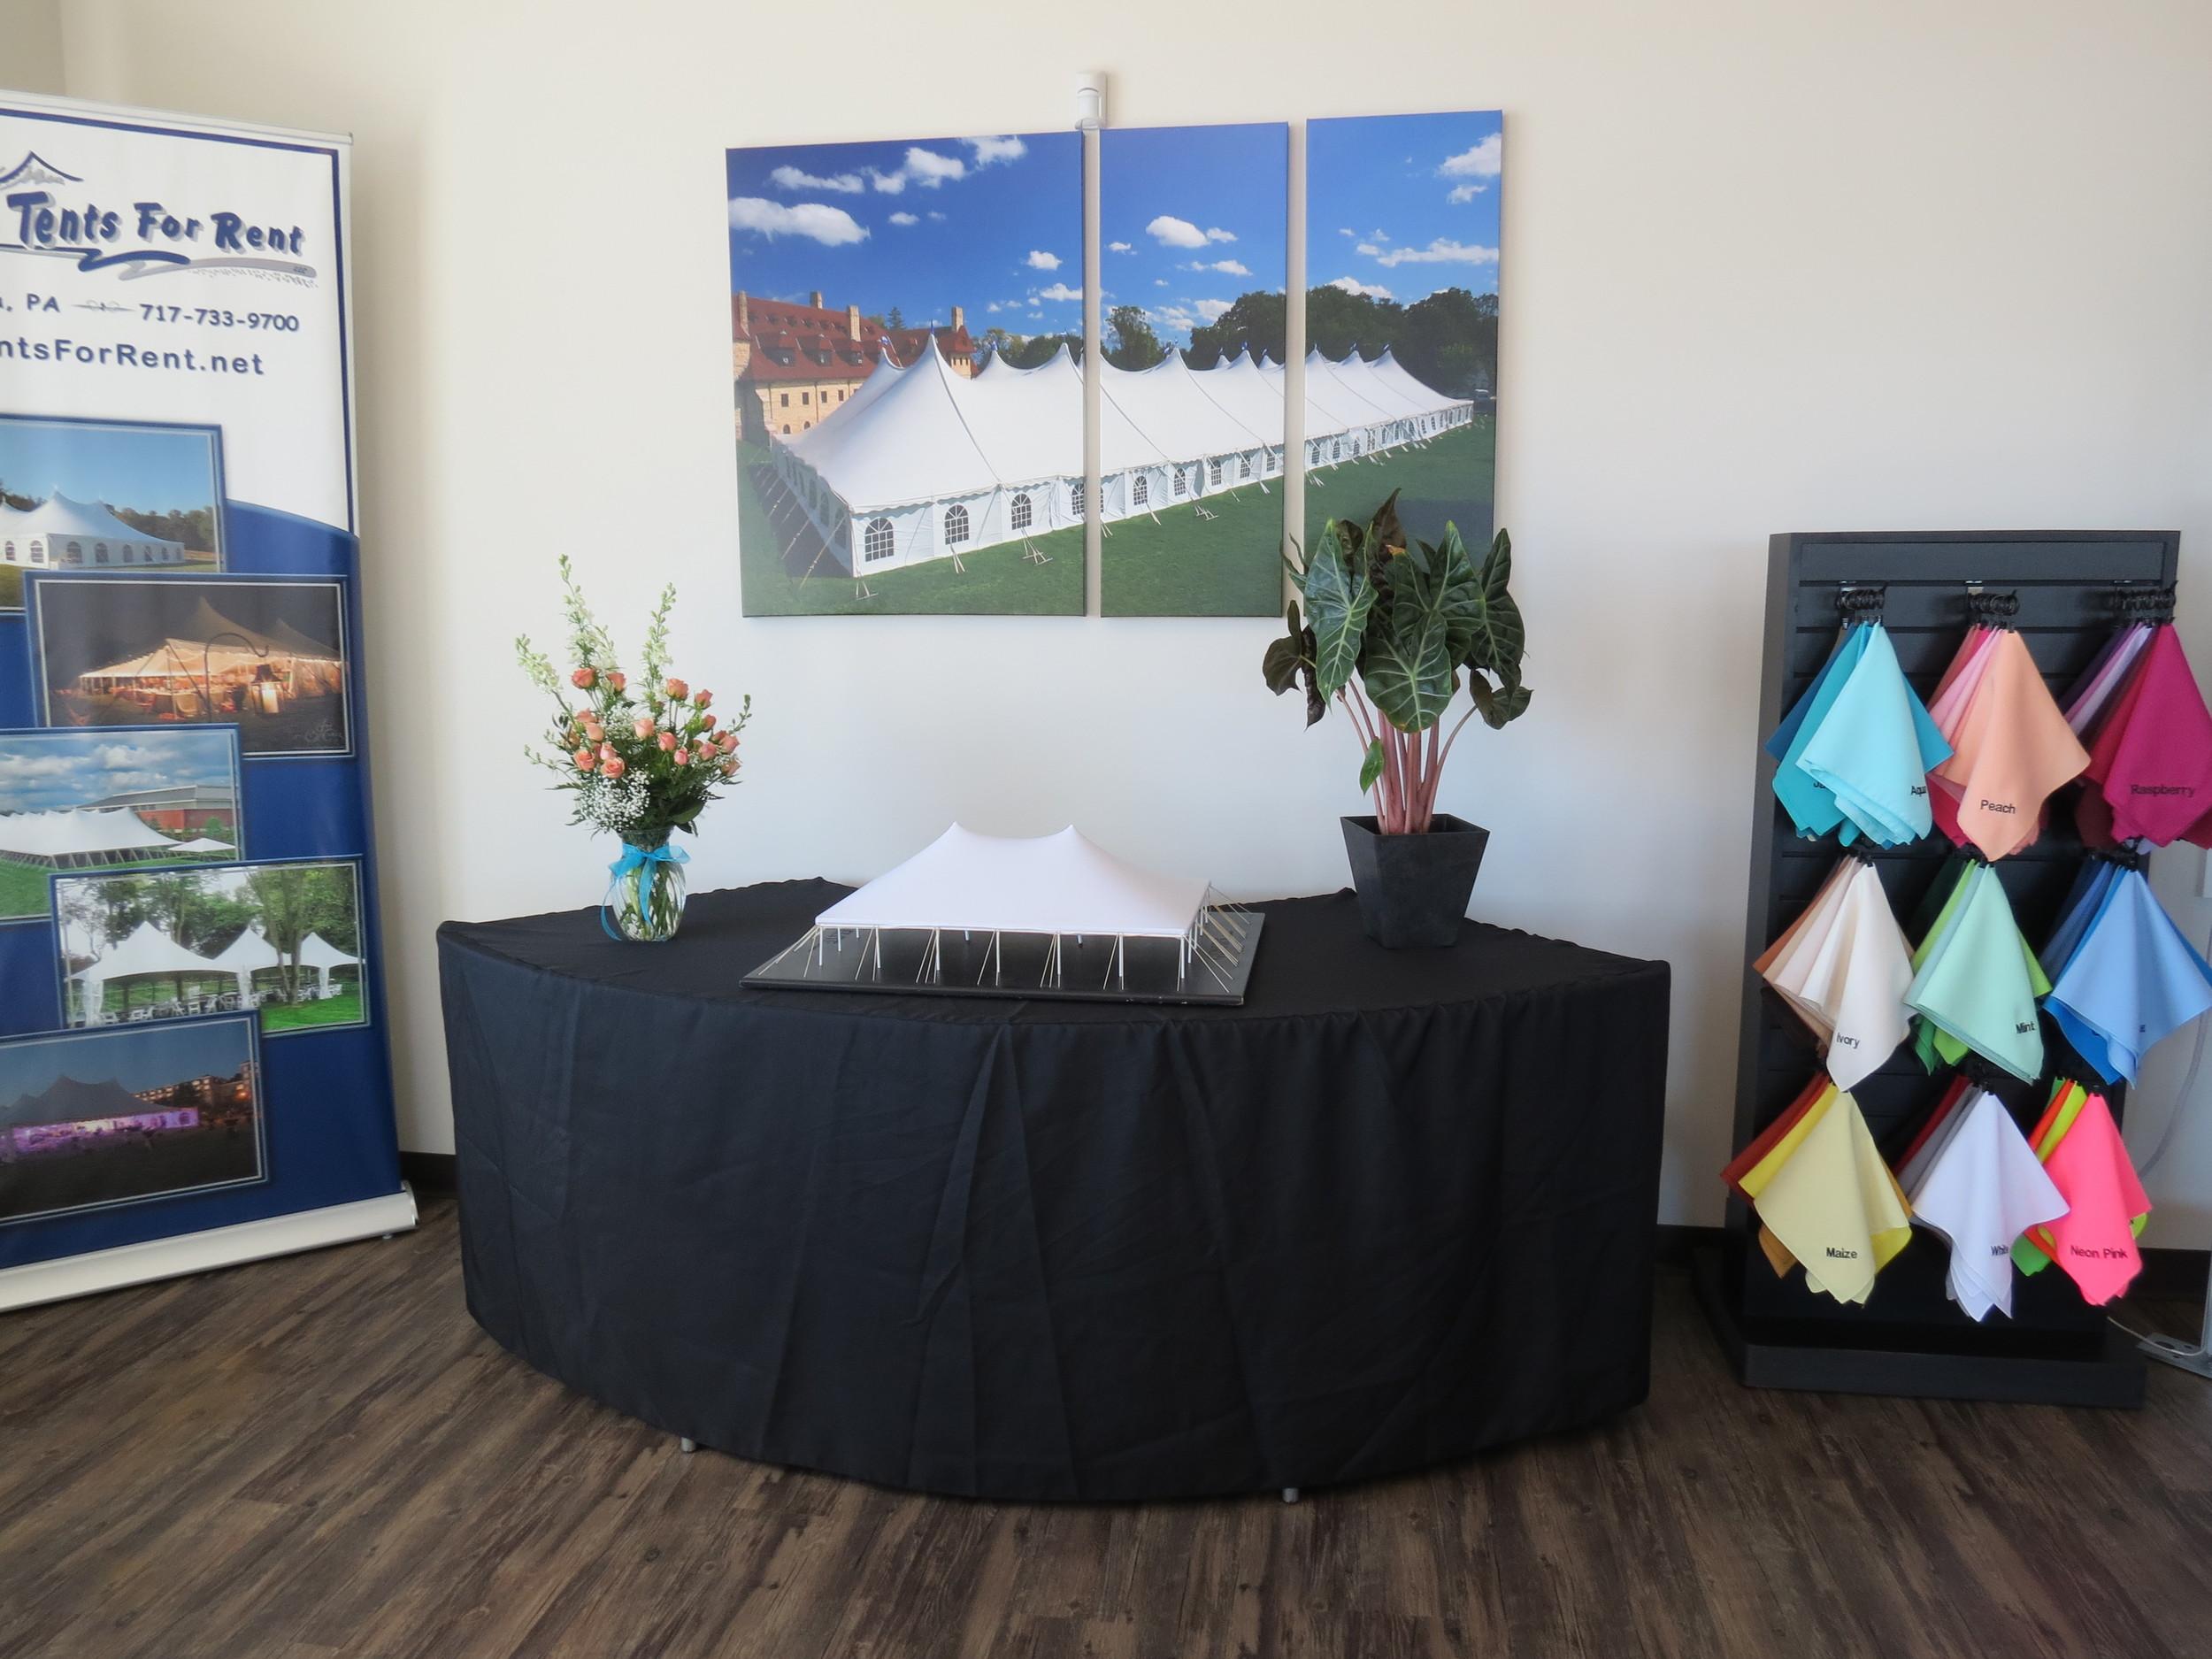 Tents For Rent showroom